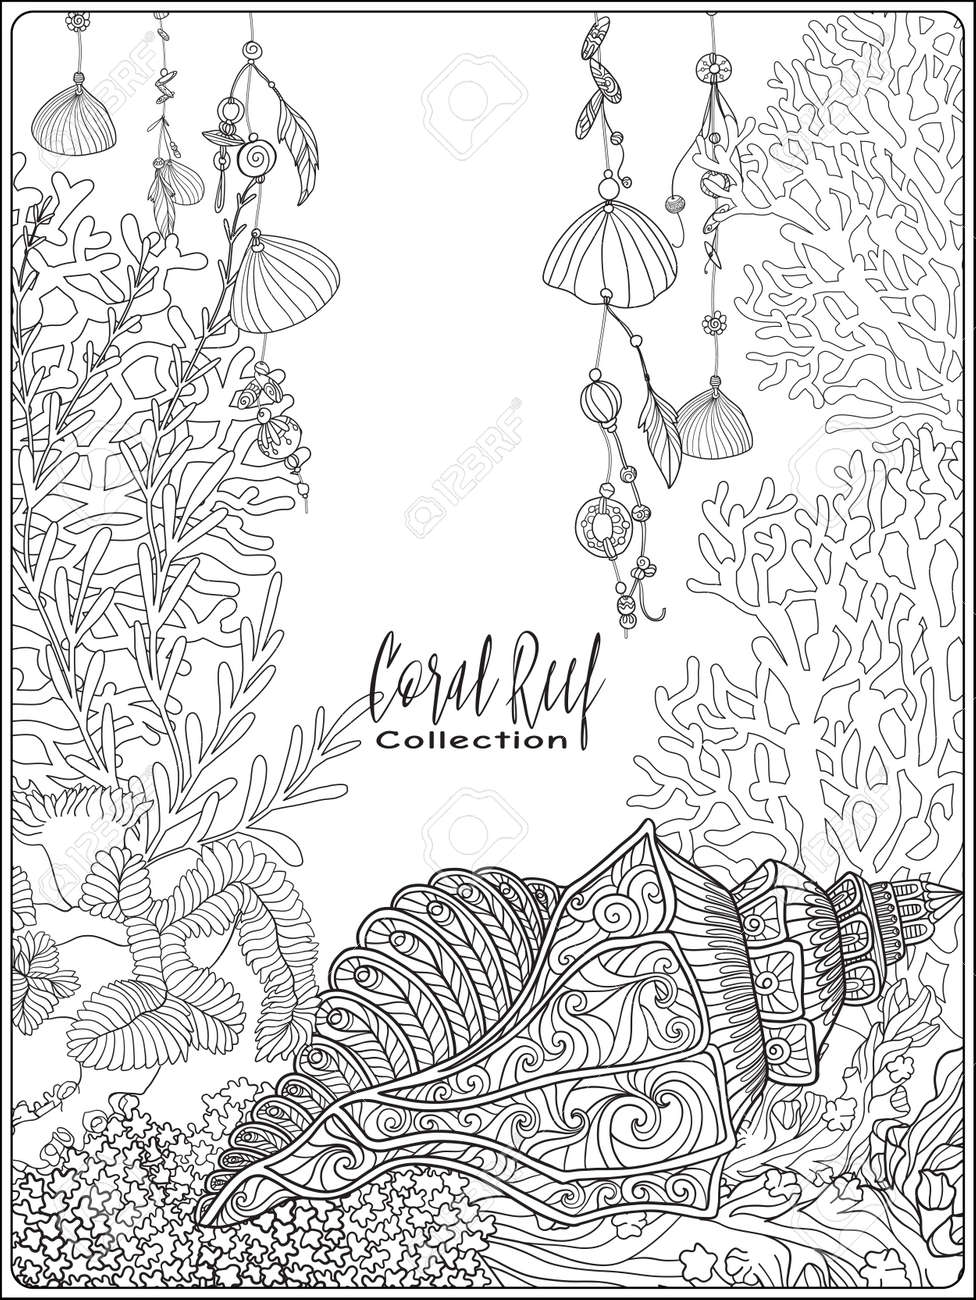 Lujoso Arrecifes De Coral Para Colorear E Imprimir Bosquejo ...